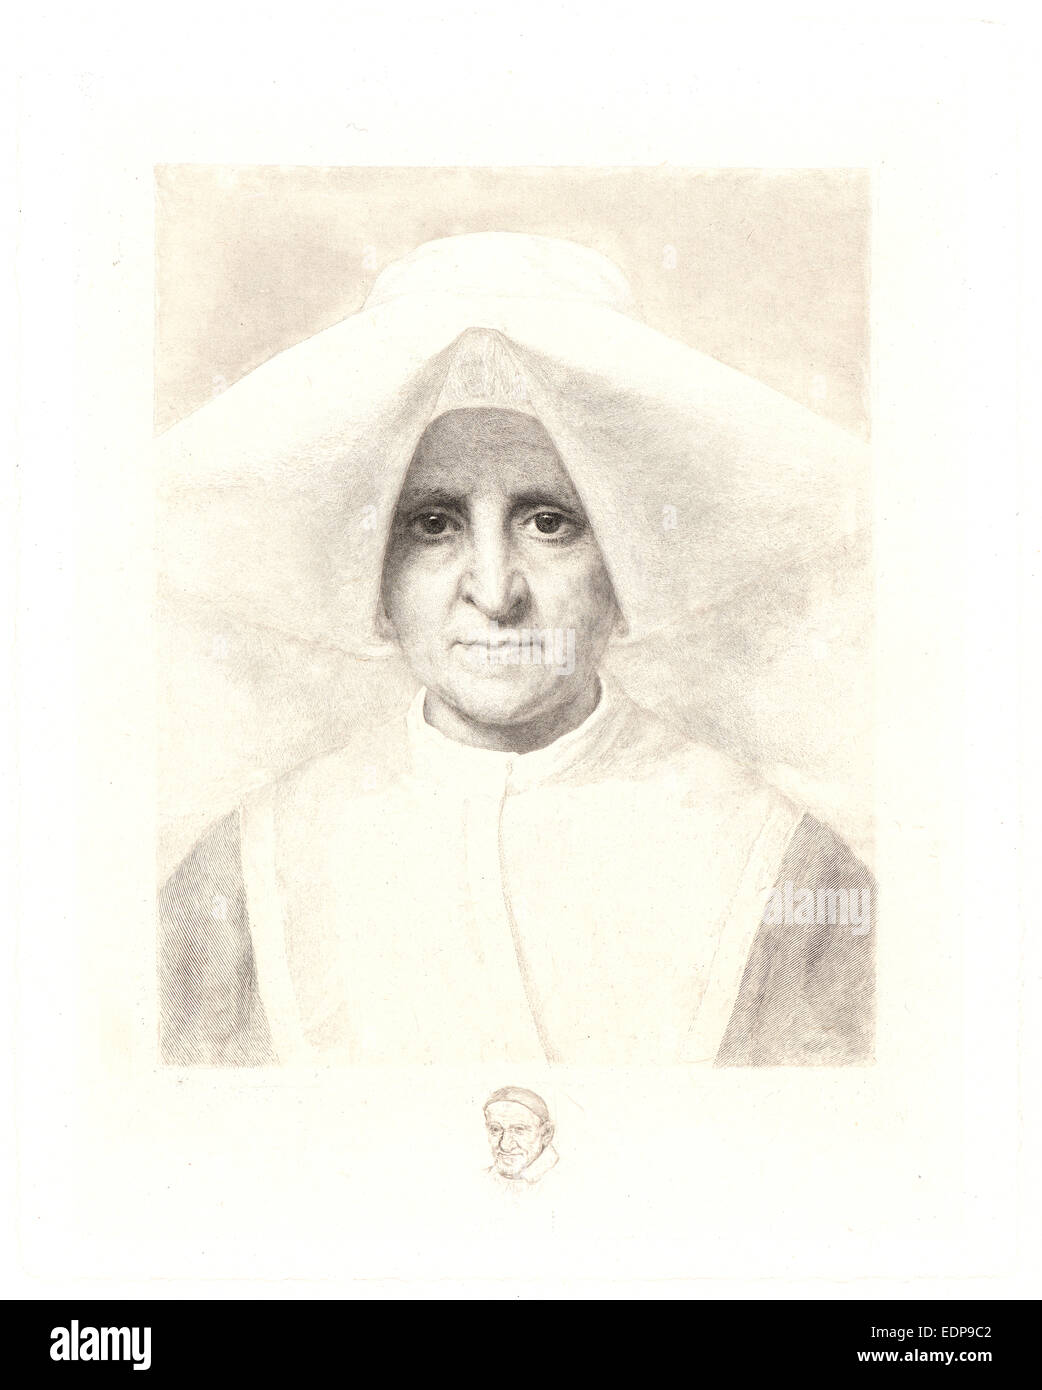 Claude-Ferdinand Gaillard (French, 1834 - 1887). La Soeur Rosalie de face, 19th century. Etching and engraving - Stock Image